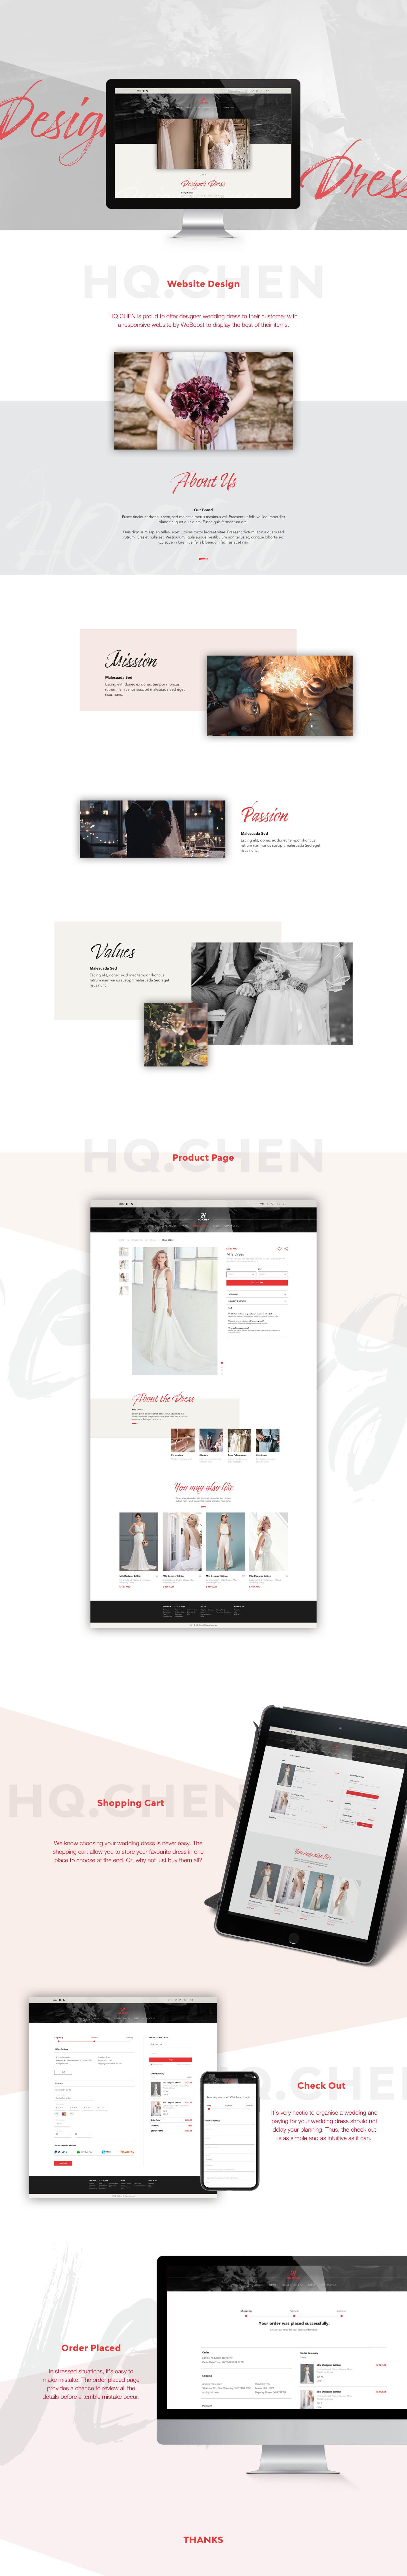 HQ. CHEN website